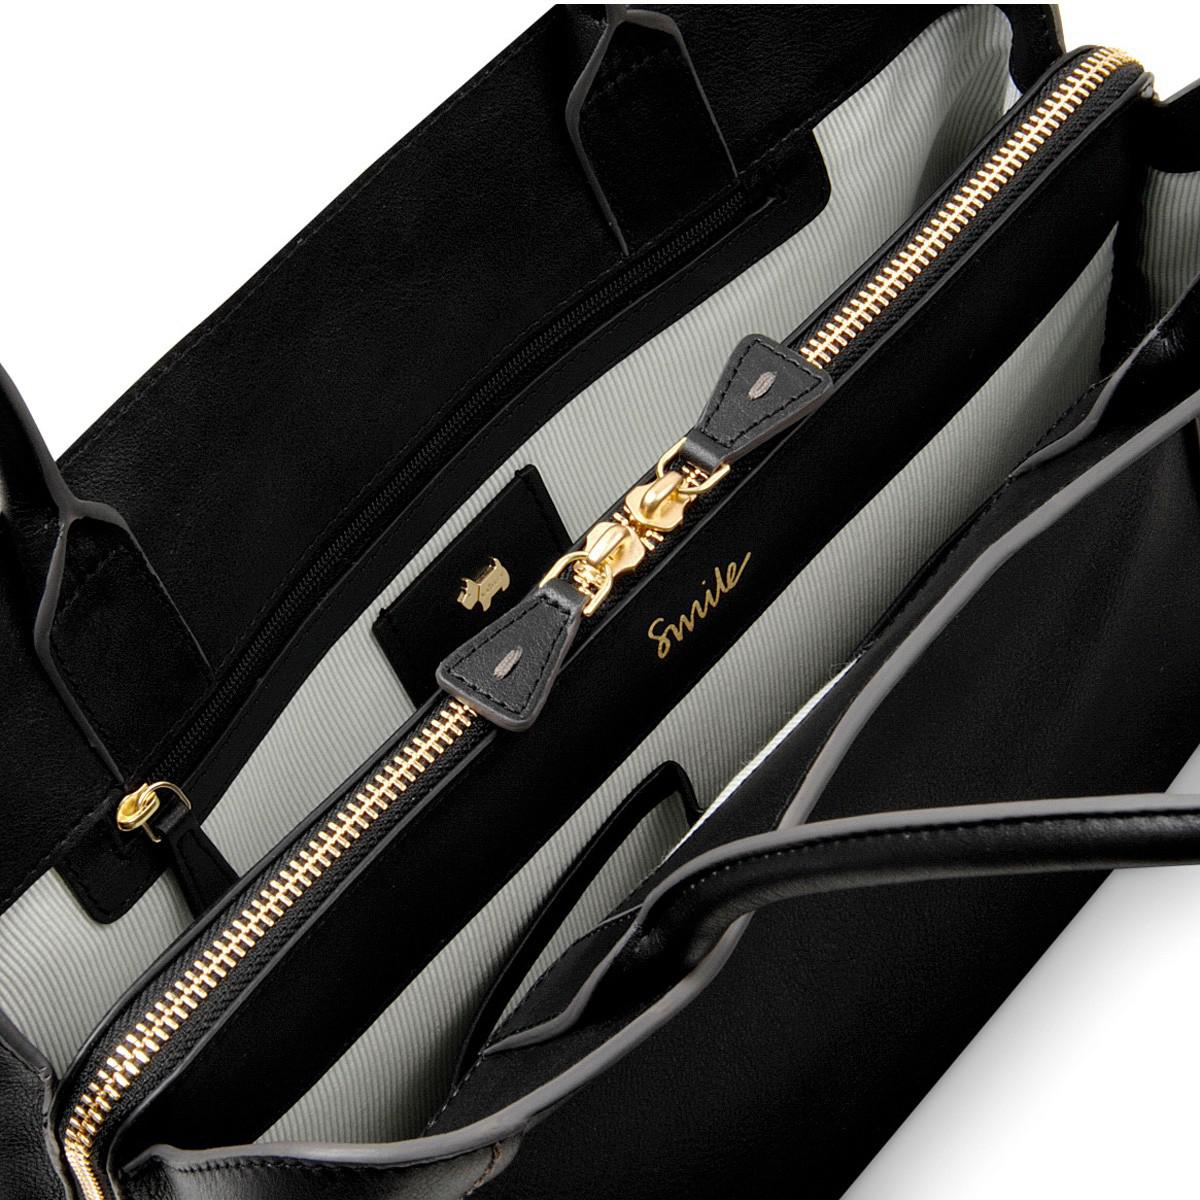 Radley Leather Primrose Hill Large Multi-compartment Tote in Black